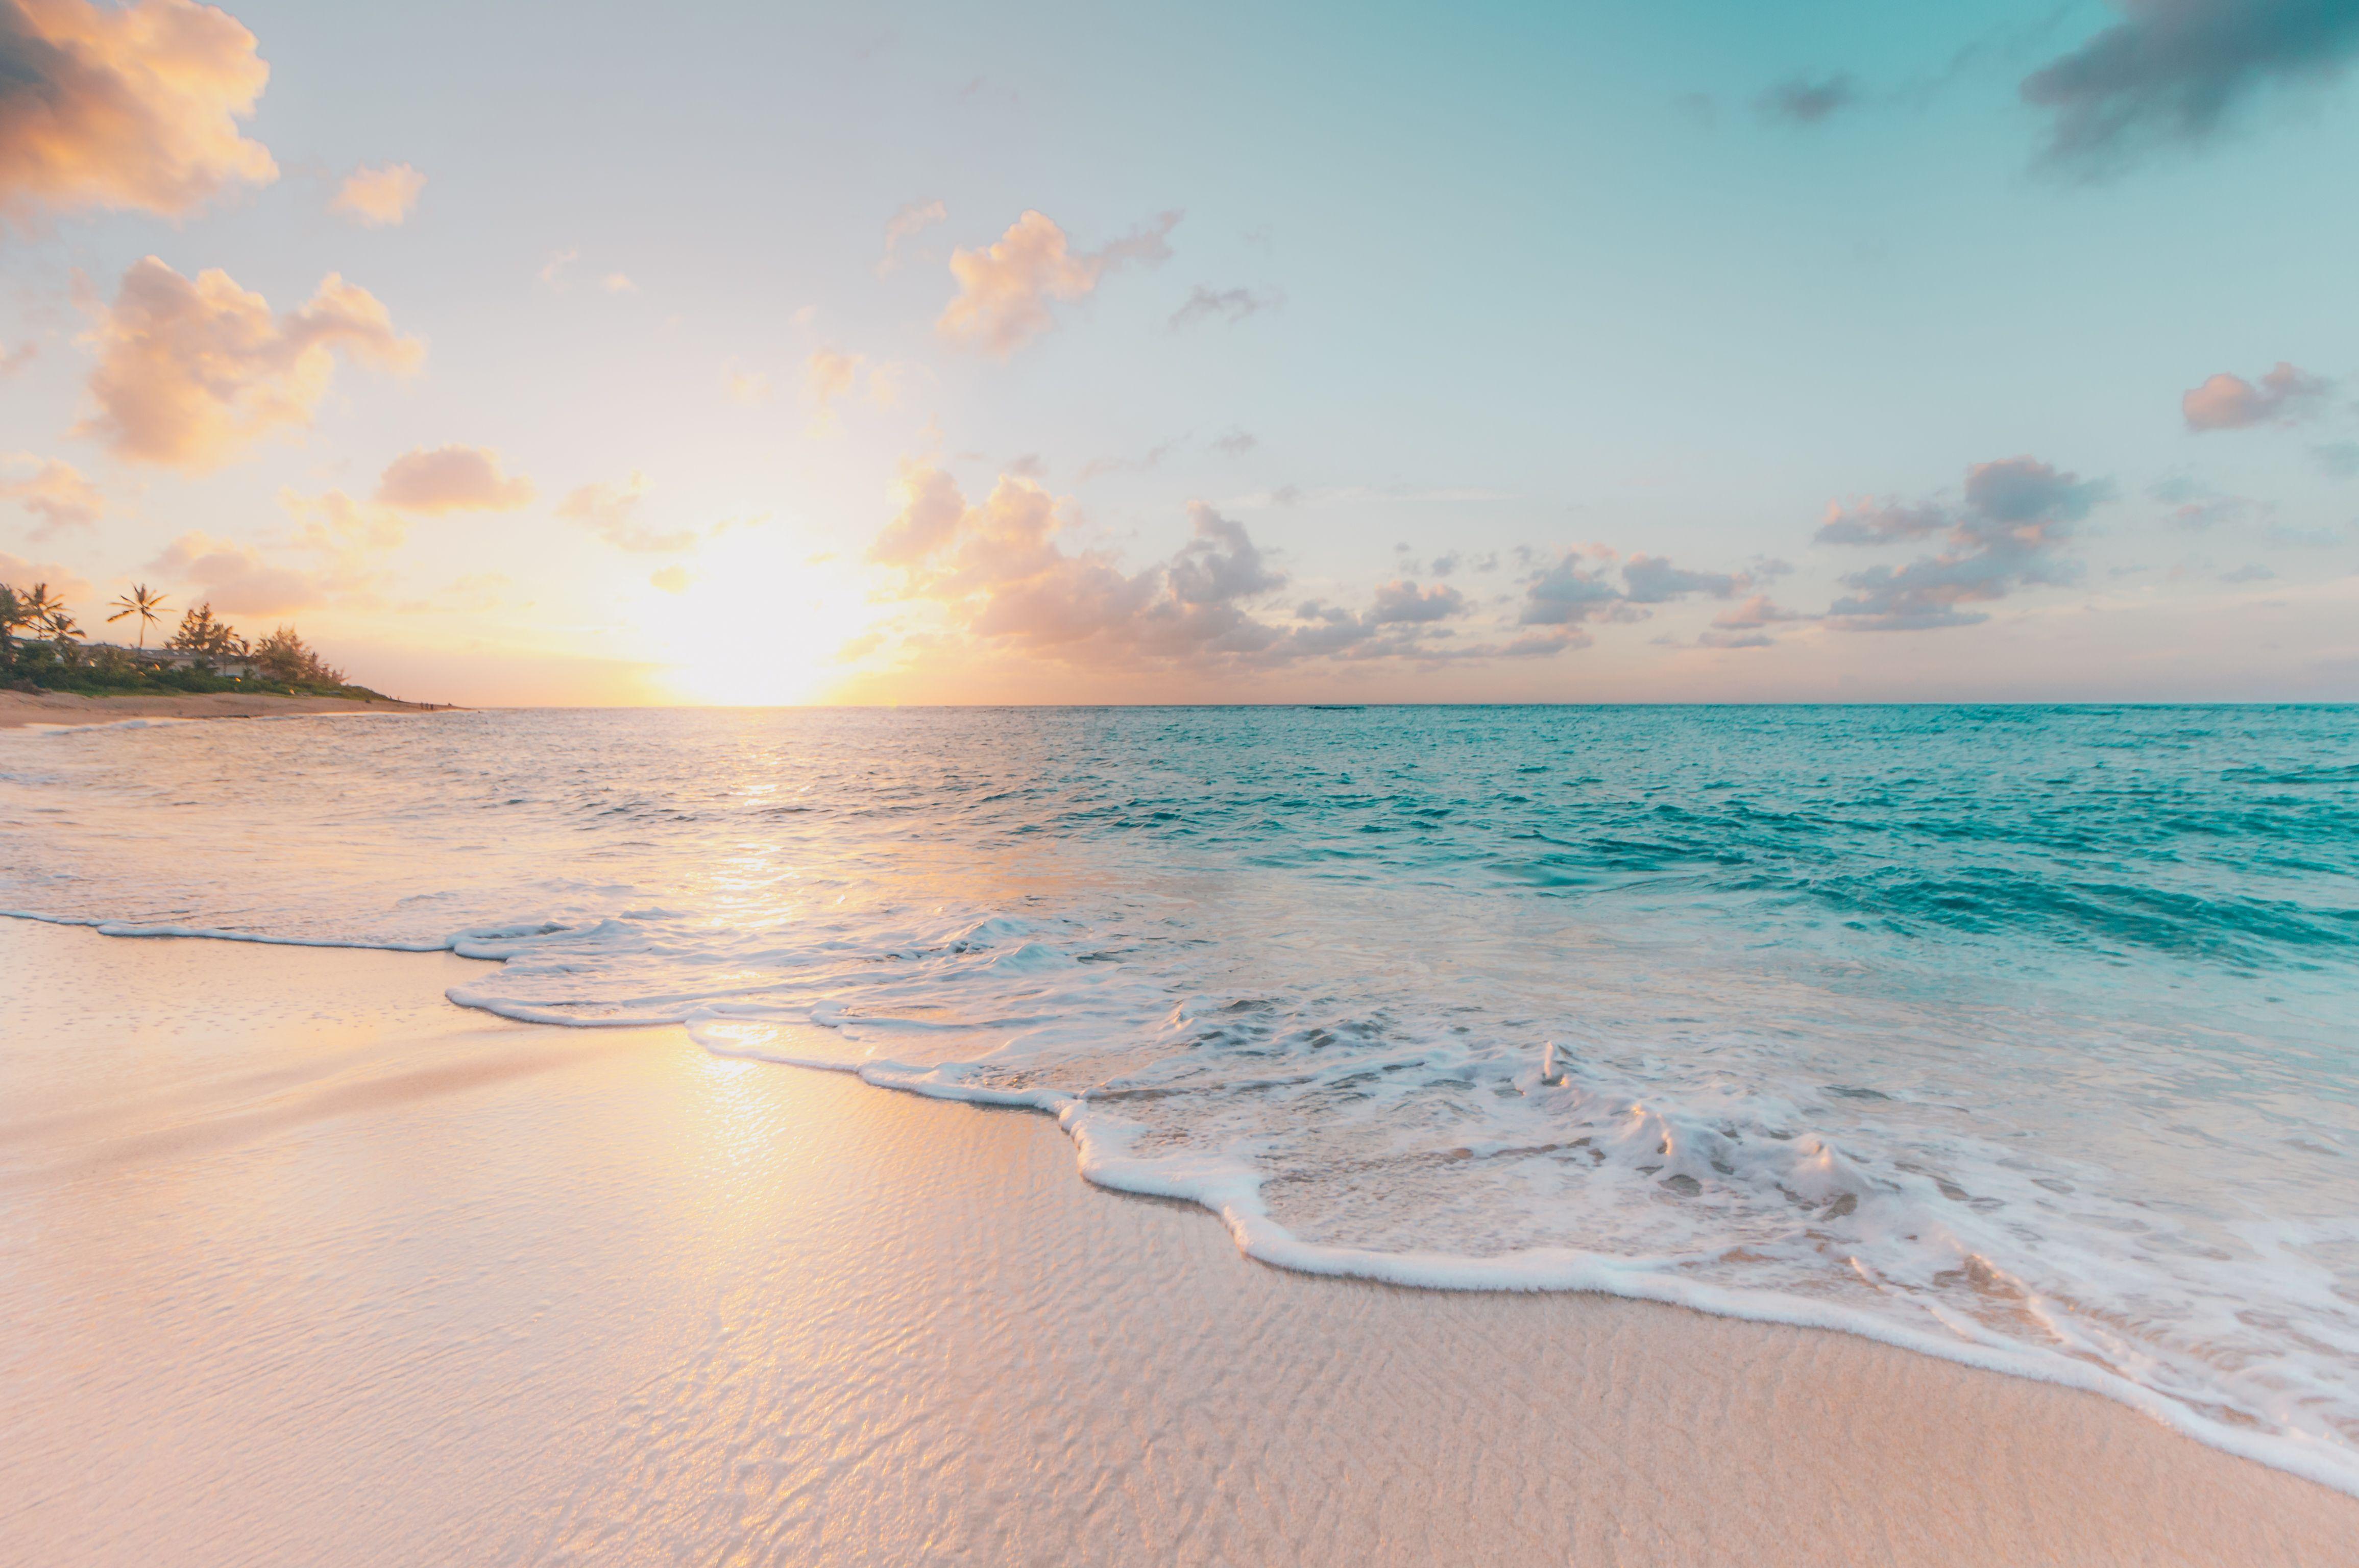 12K Ocean Beach Wallpapers   Top Free 12K Ocean Beach Backgrounds ...